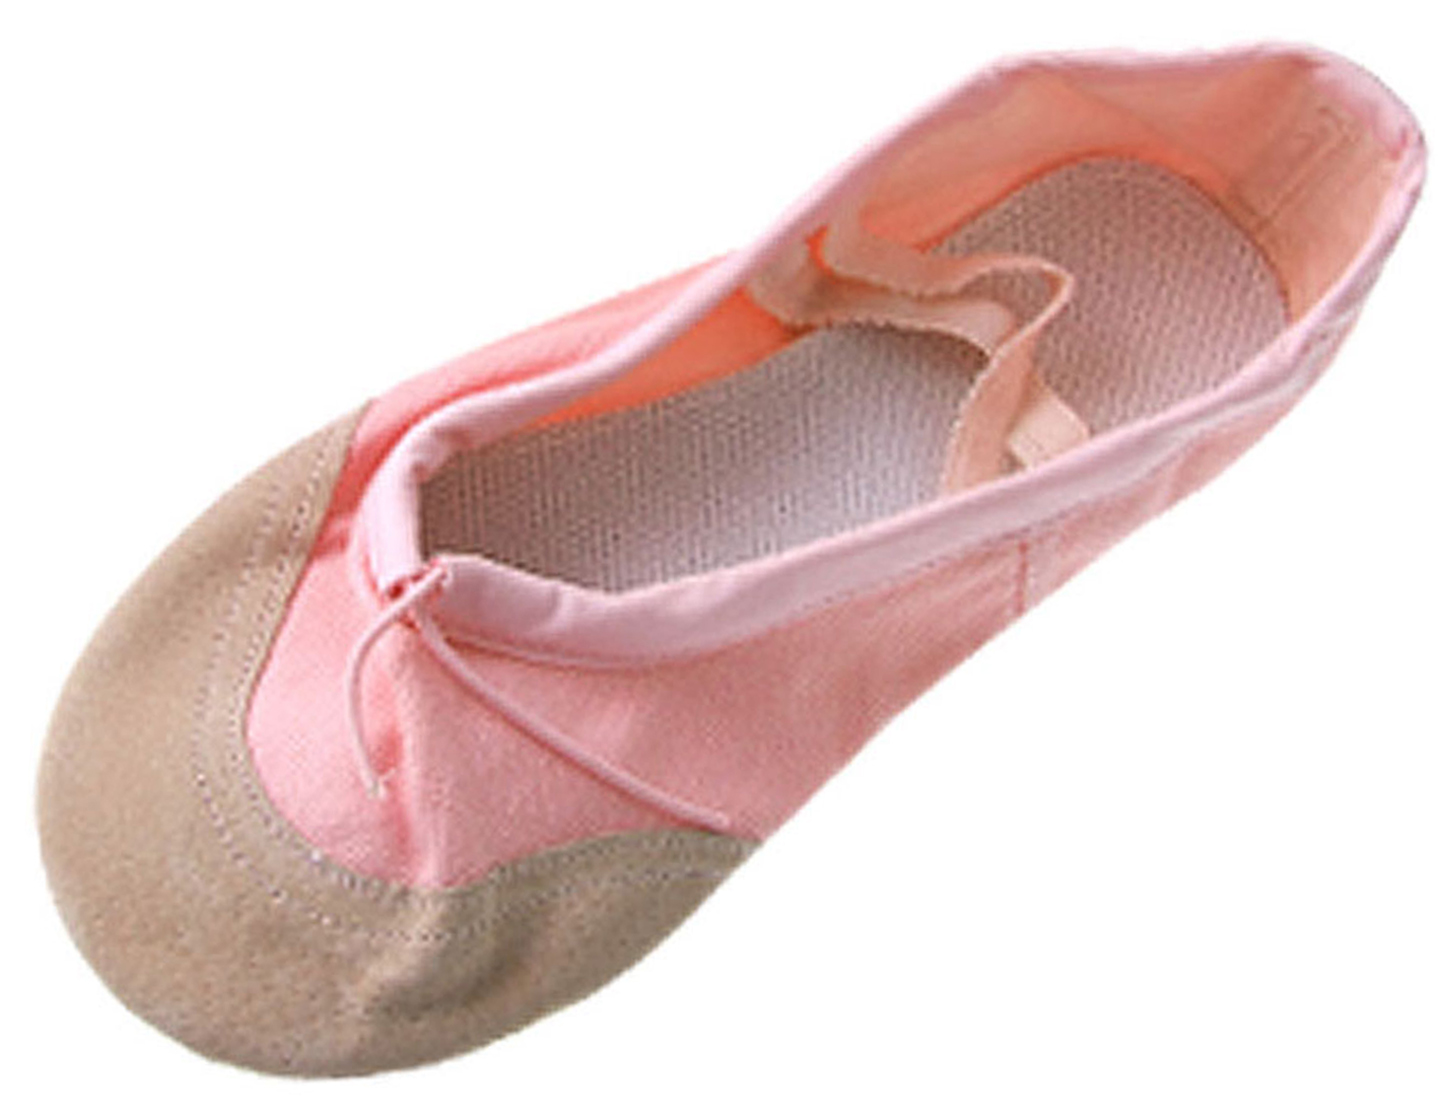 US Size 13.5 Dancing Ballet Pink Canvas Flat Shoes